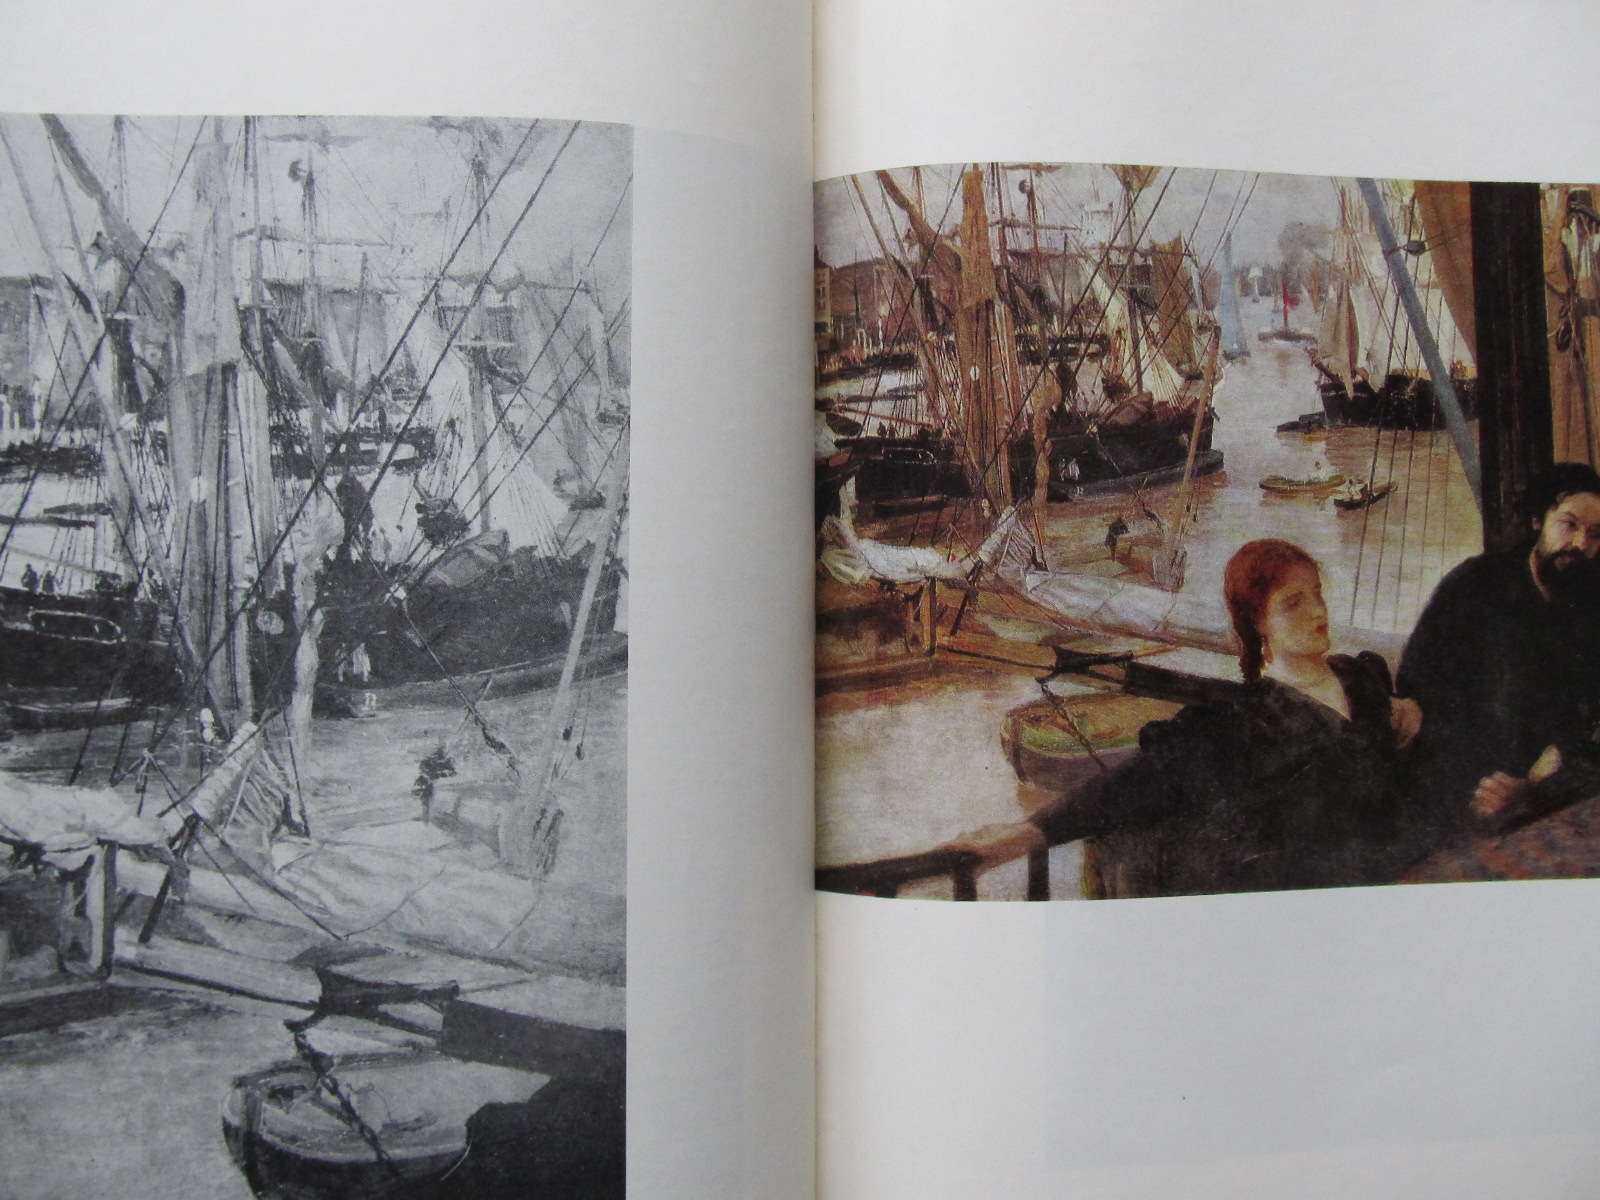 Carte Whistler (Album) - format foarte mare - Vasile Nicolescu